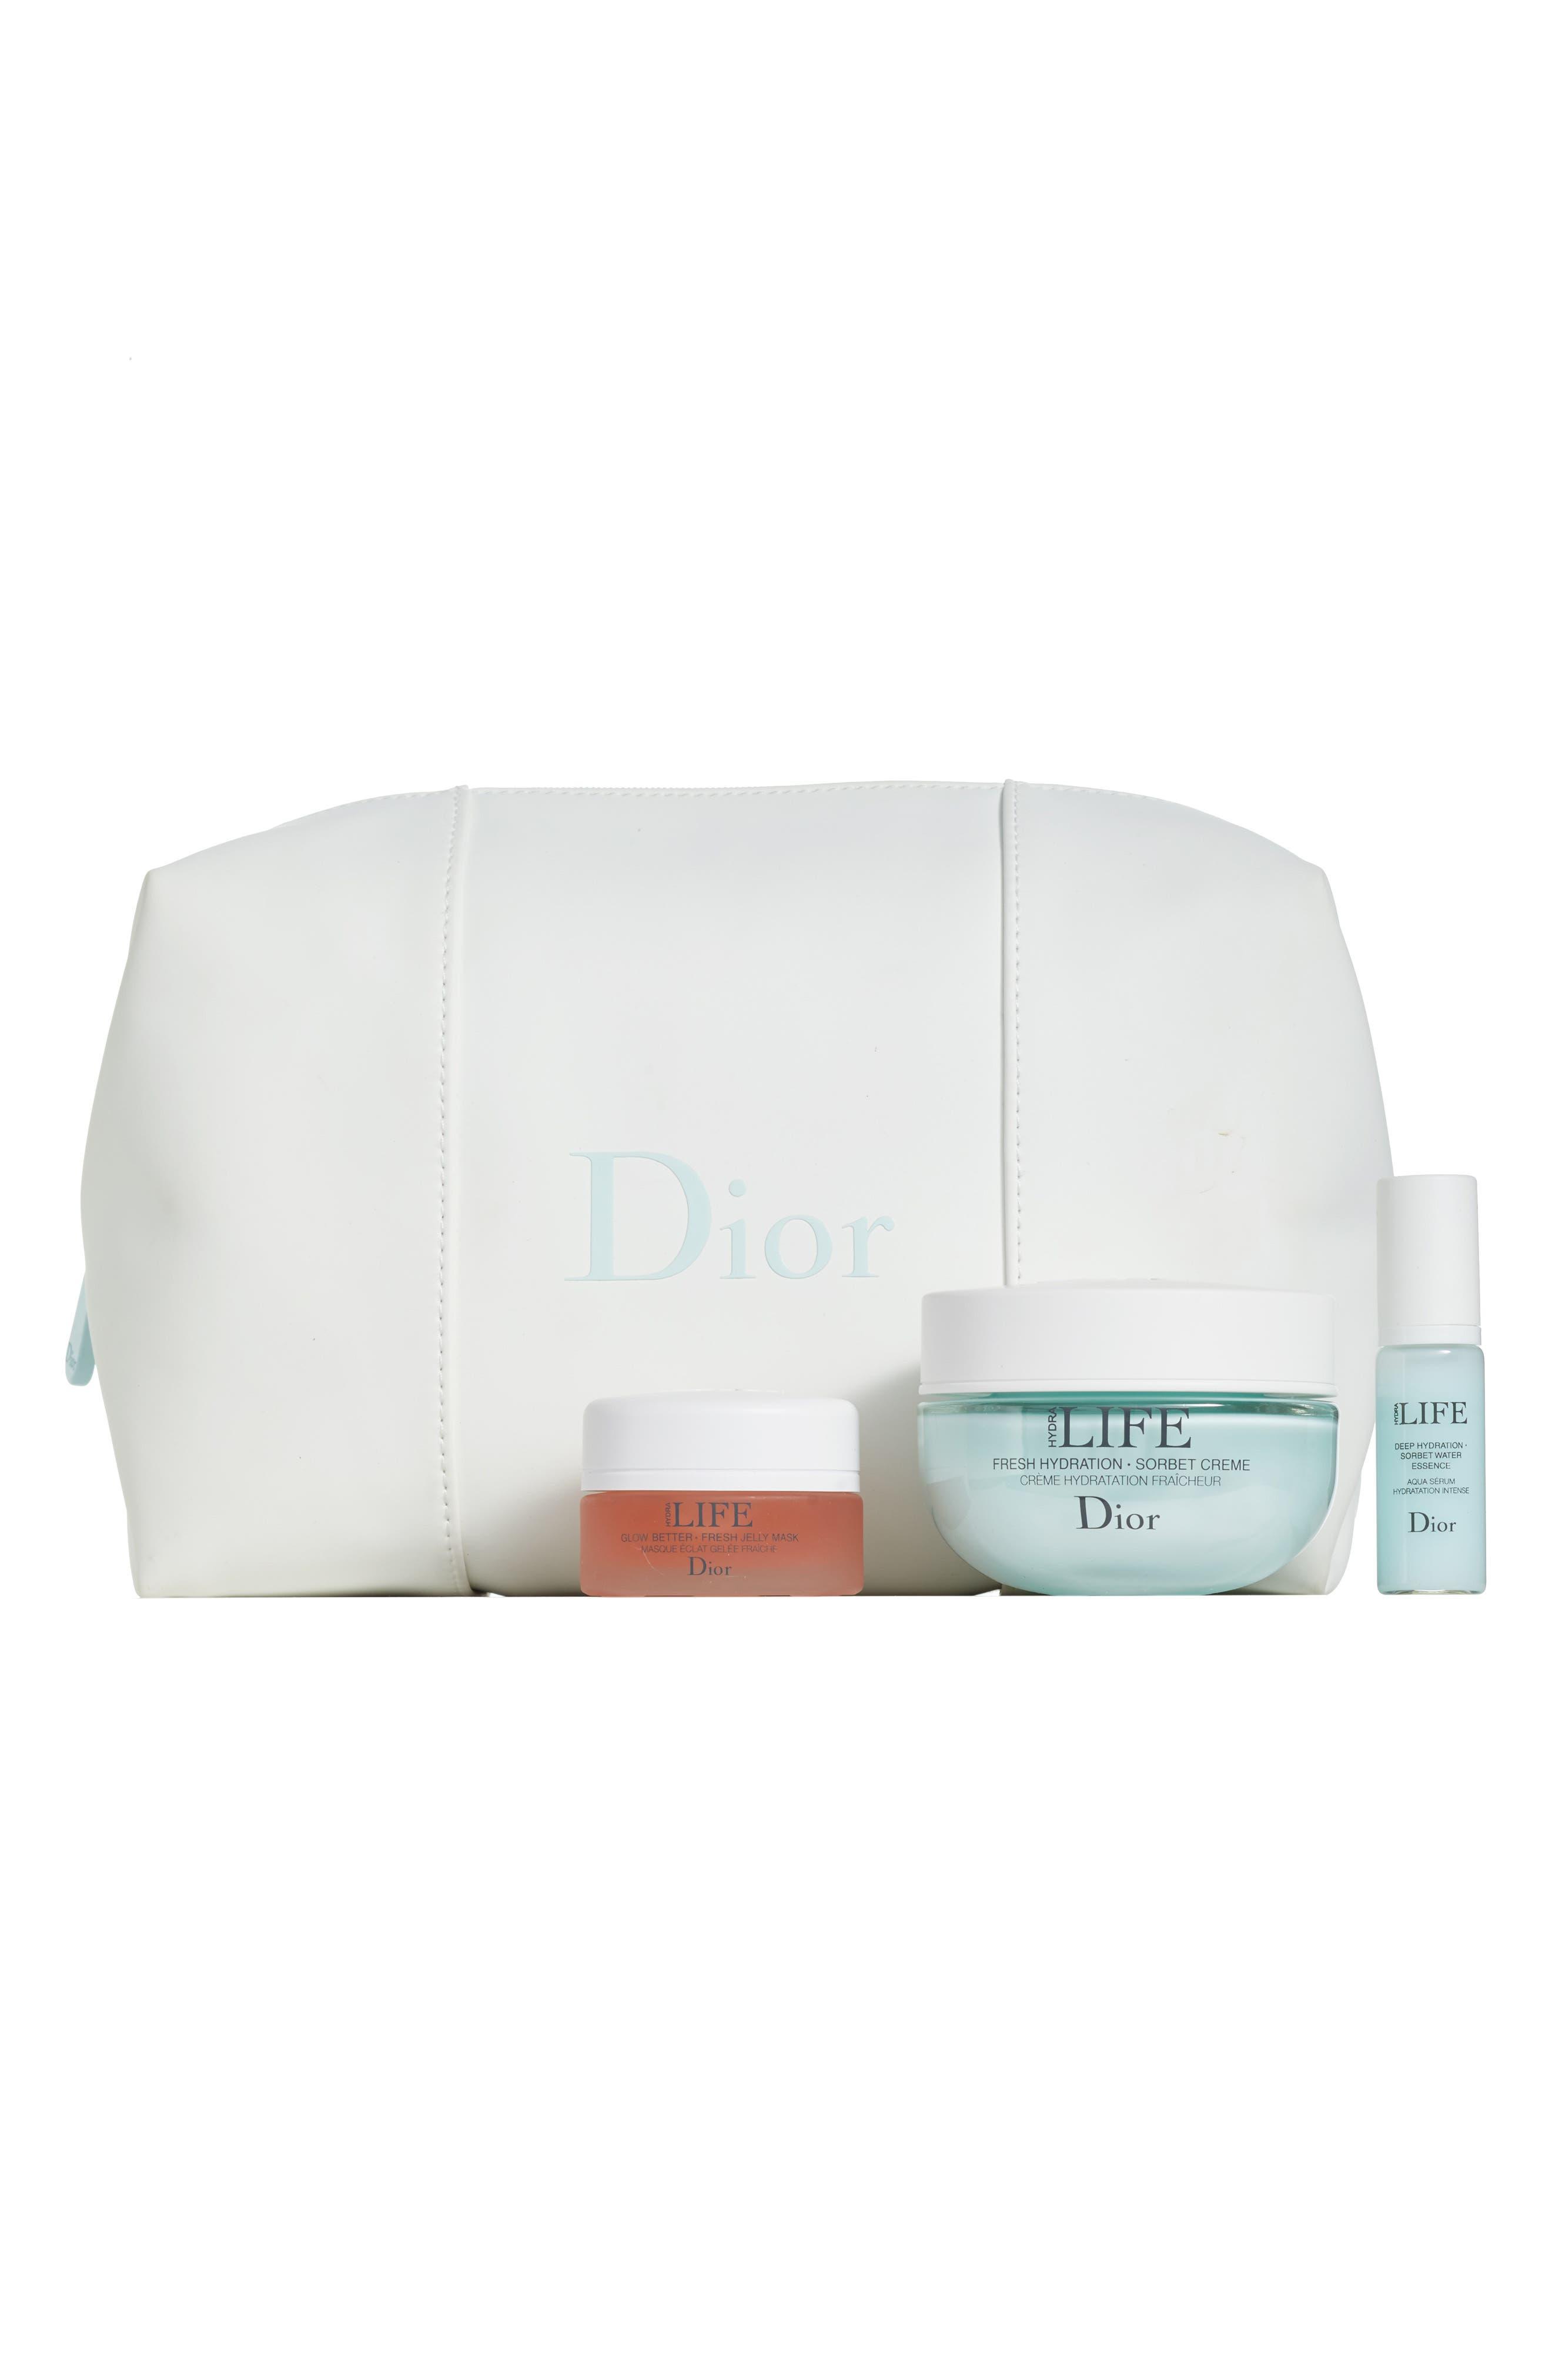 Alternate Image 1 Selected - Dior Hydra Life Set ($102 Value)